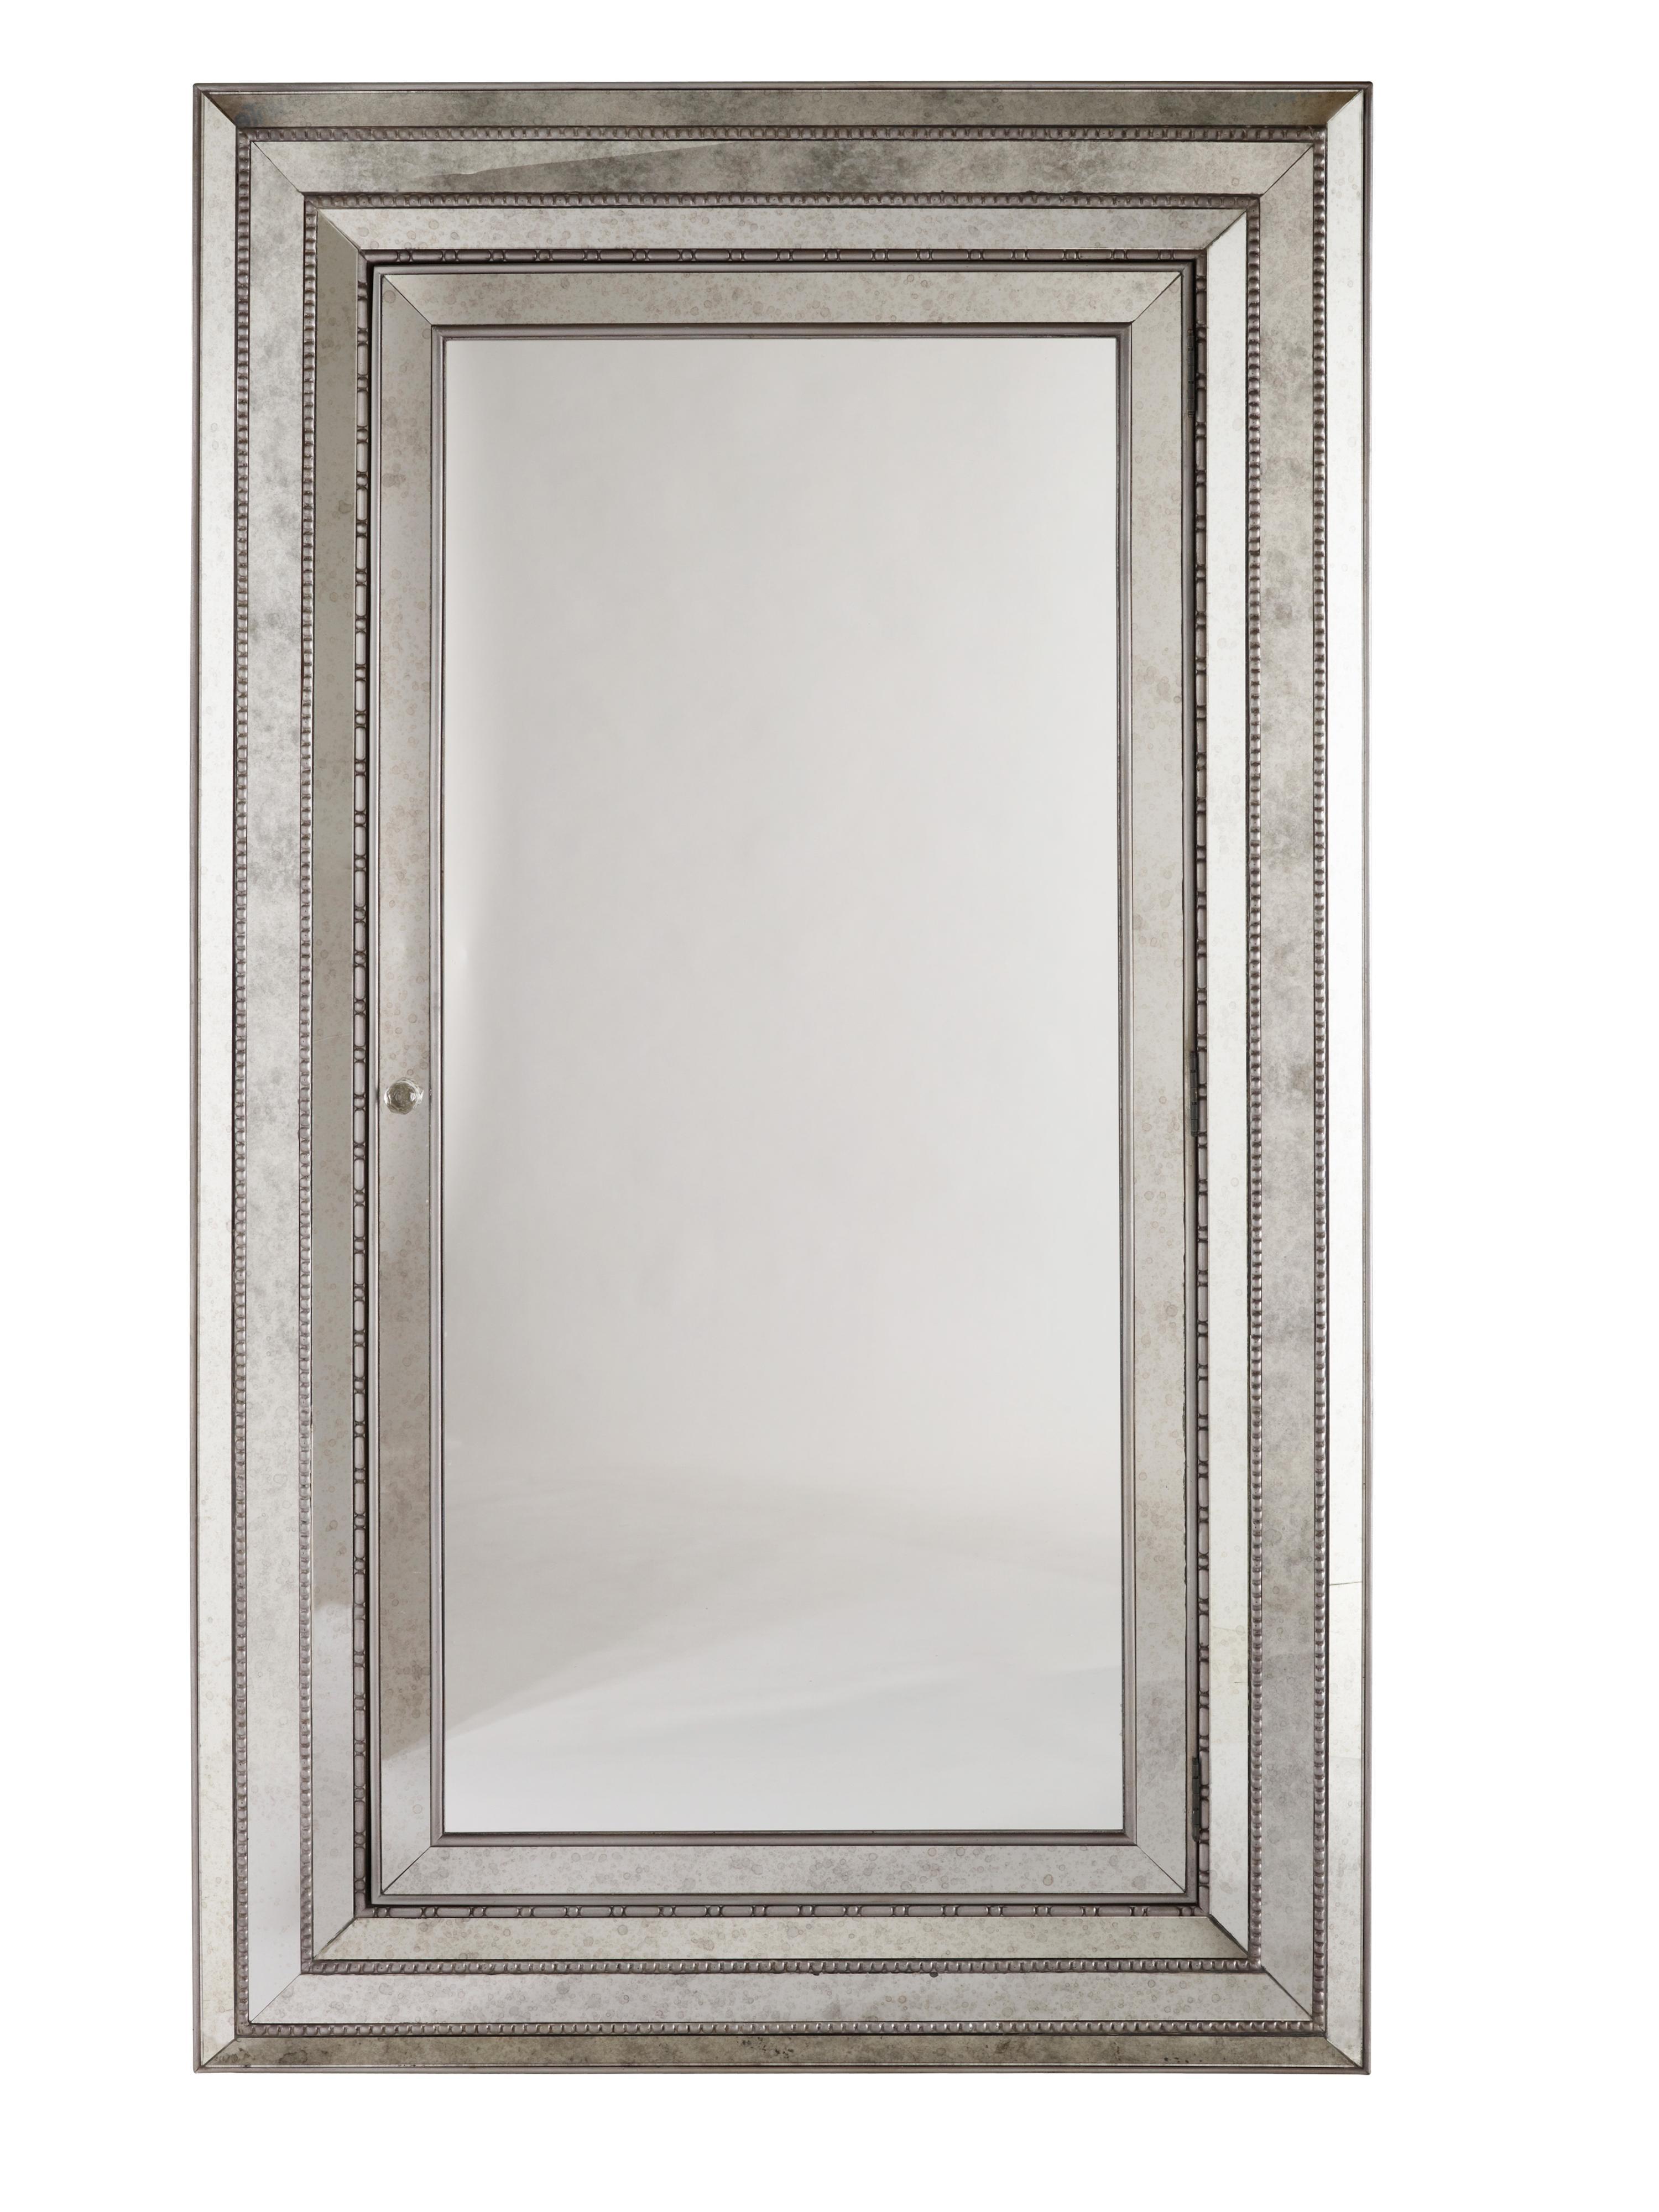 Melange Glamour Floor Mirror by Hooker Furniture at Miller Waldrop Furniture and Decor